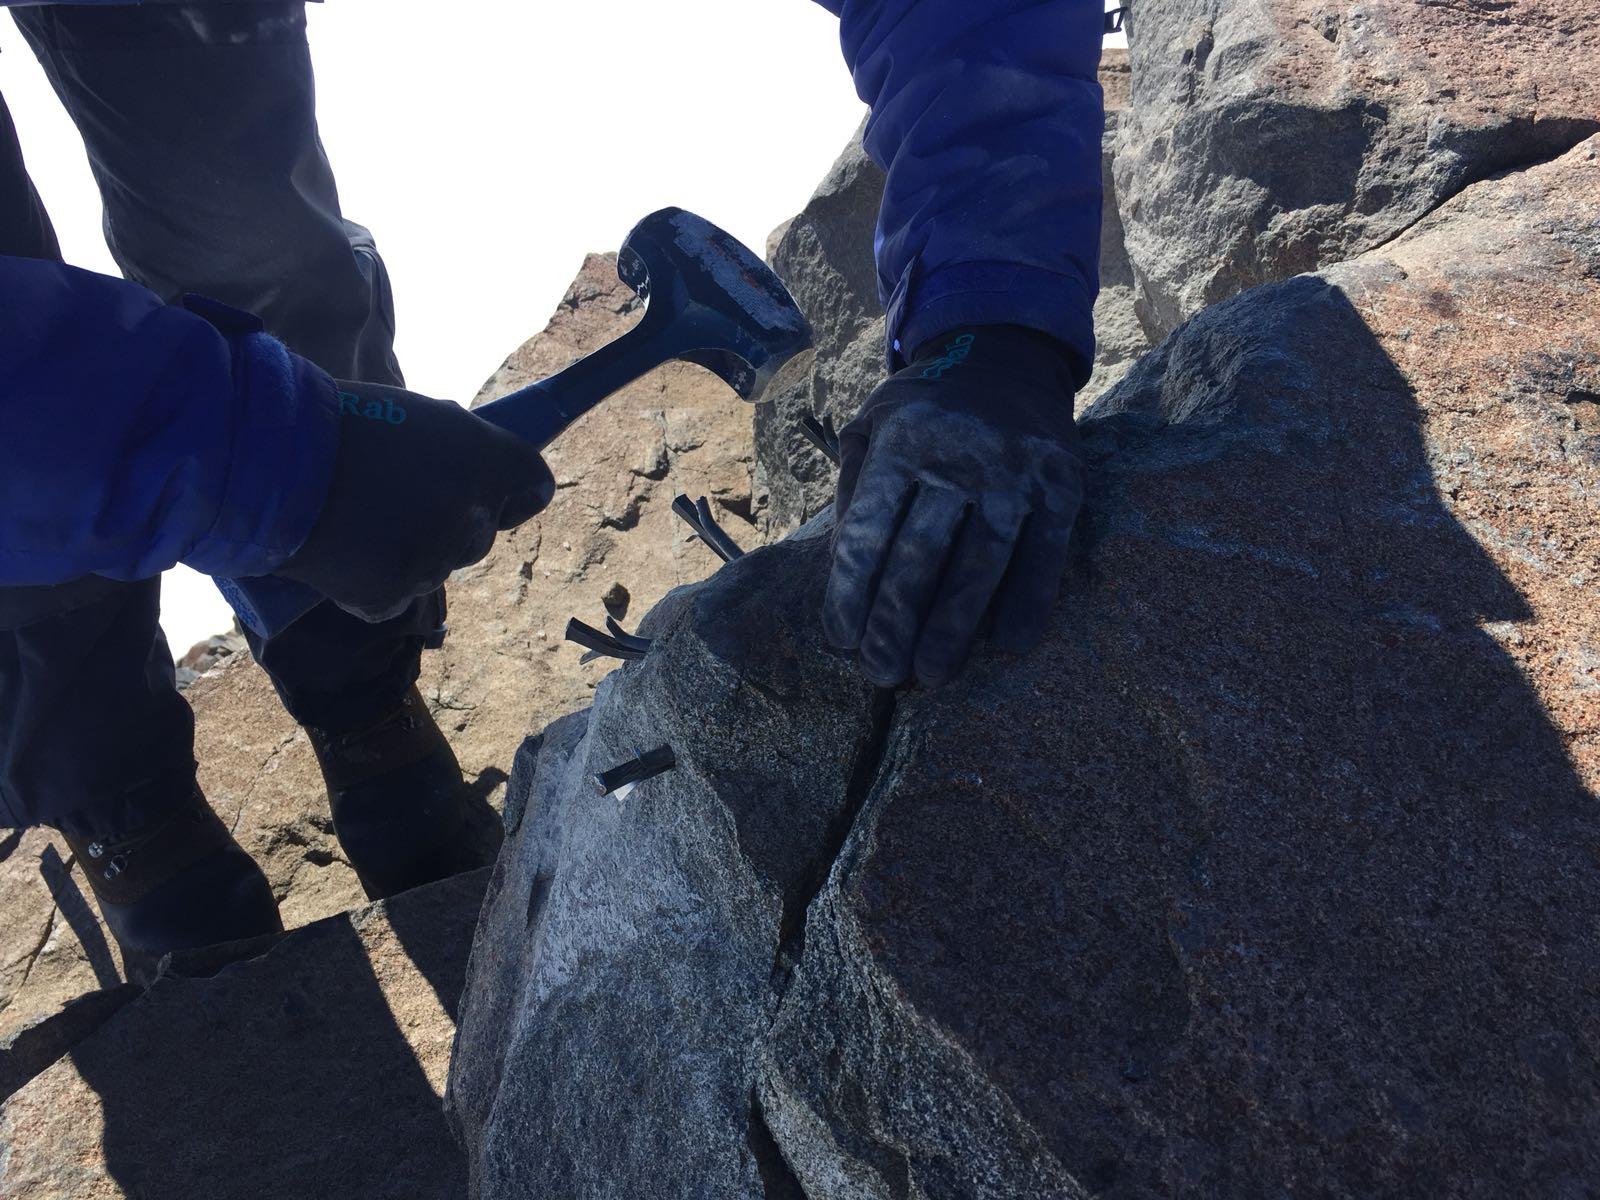 Forskare tar ett stenprov